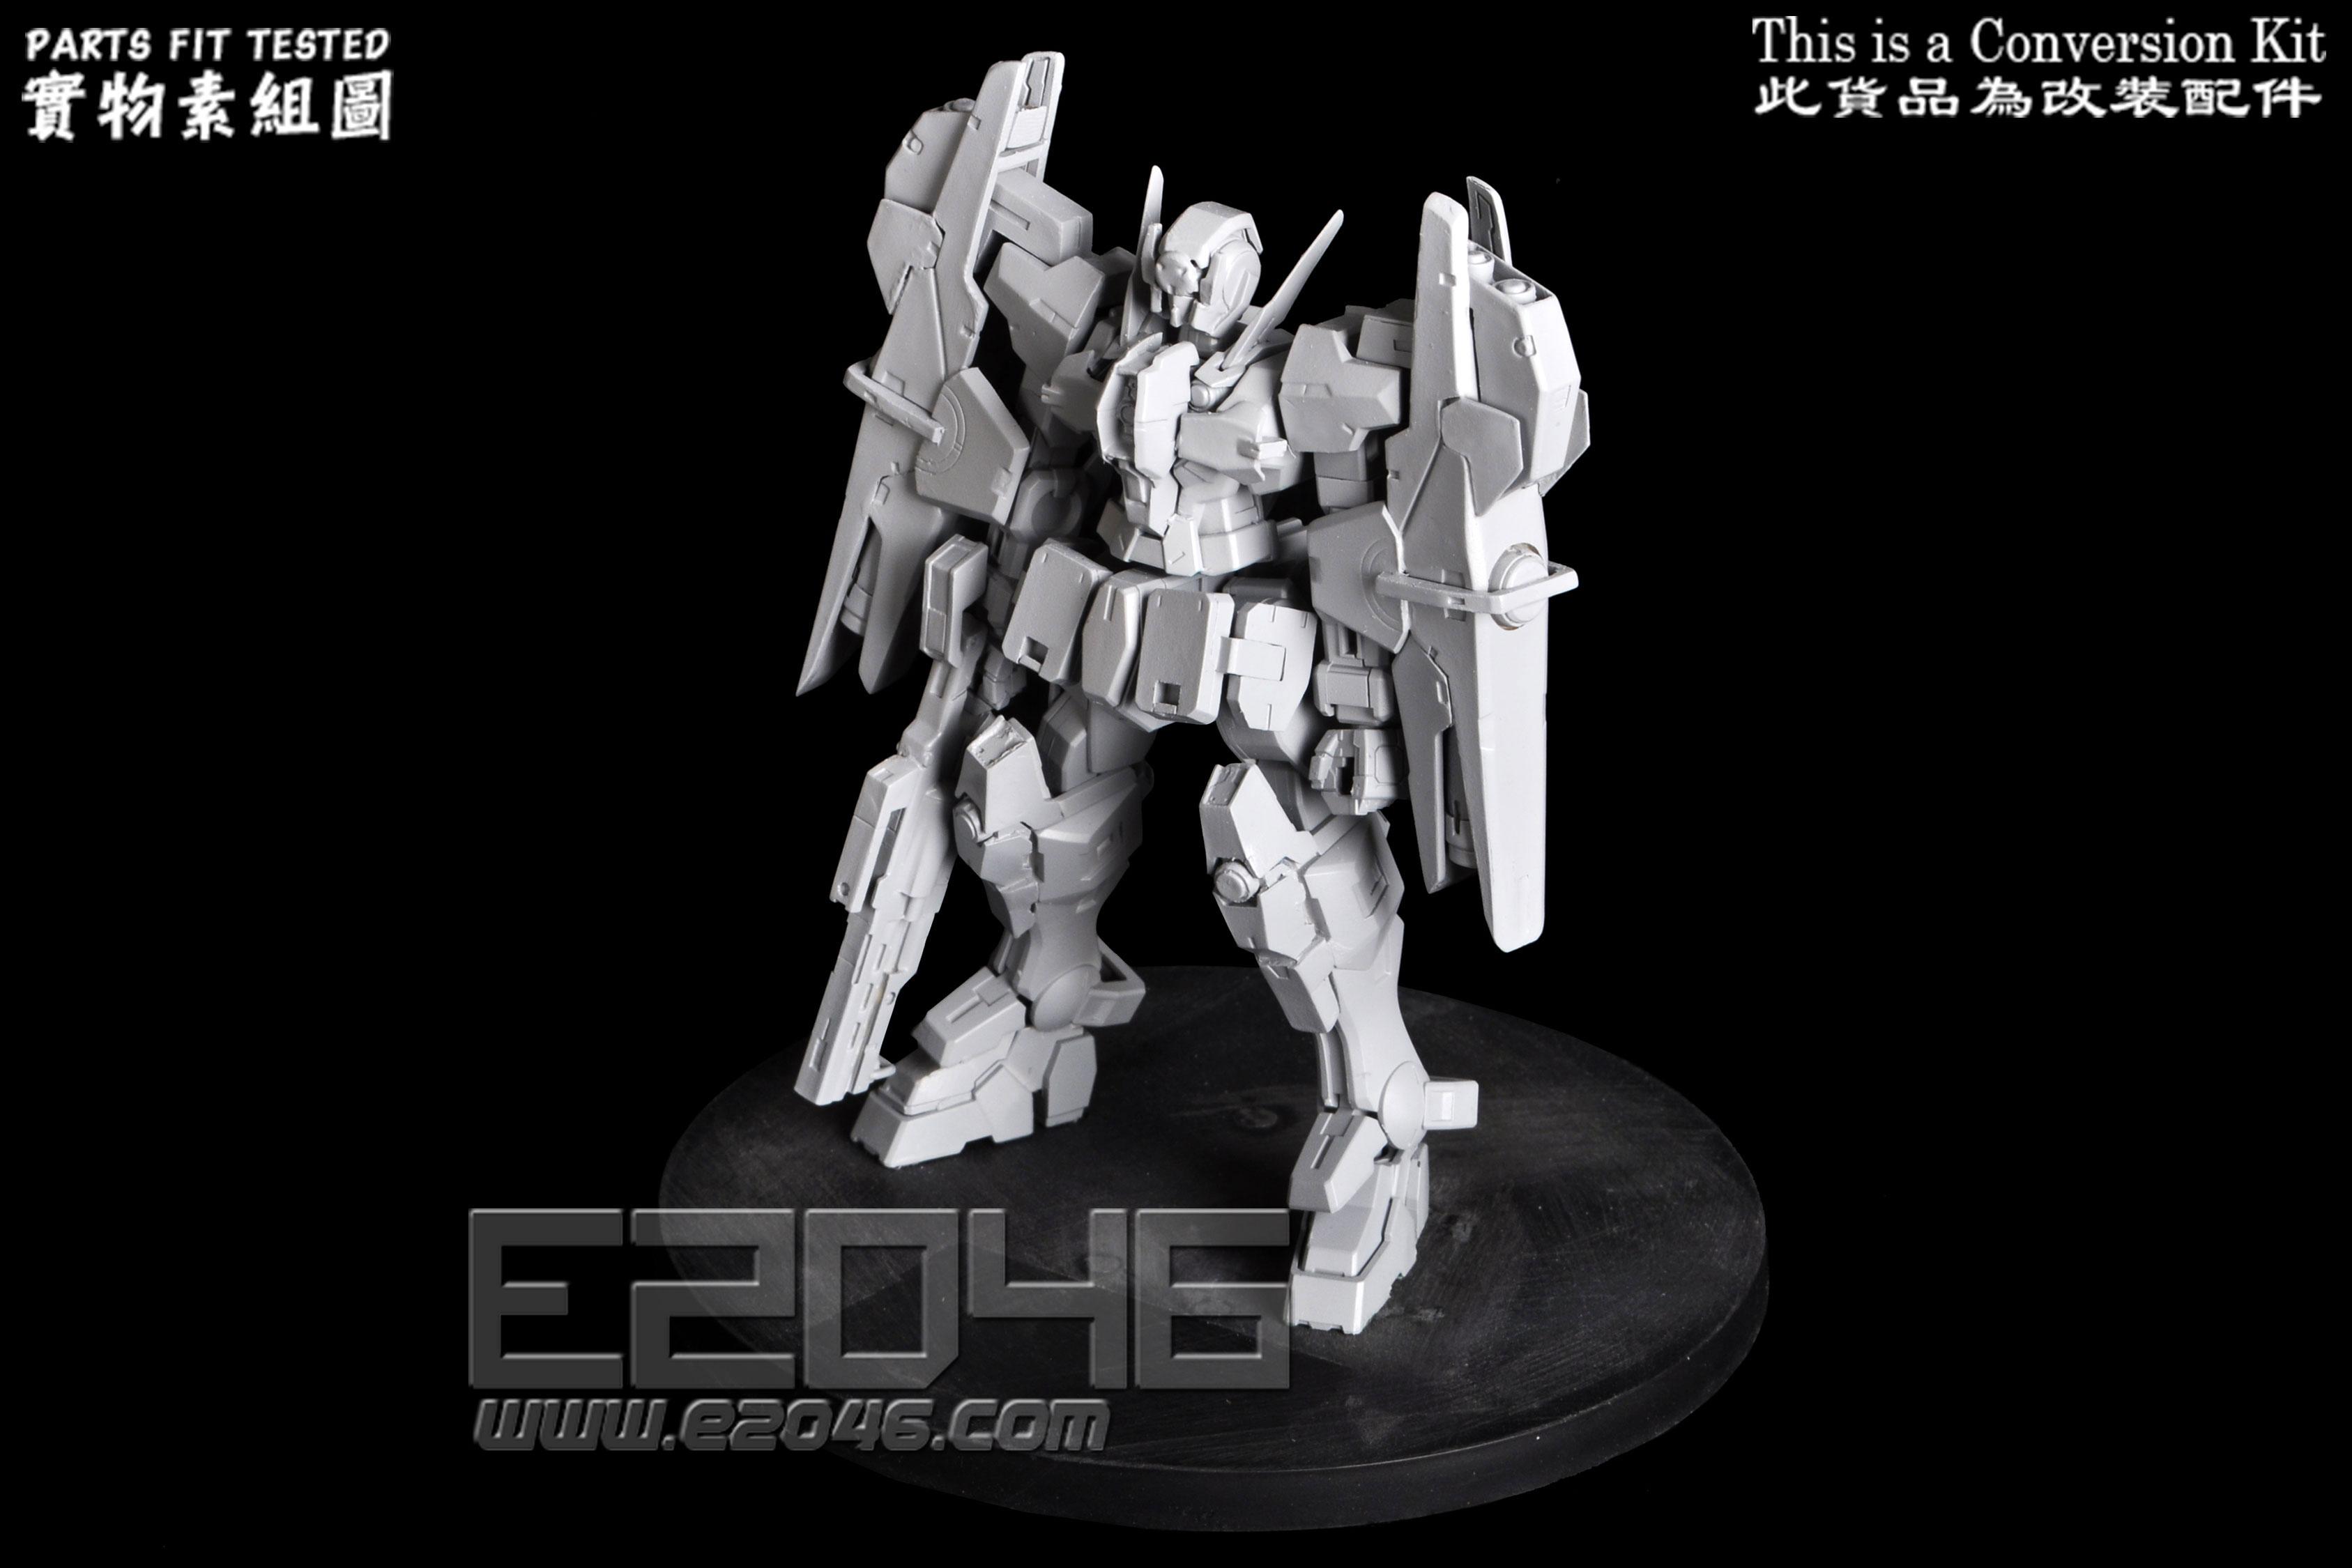 GNY-002F Gundam Sadalsuud F Conversion parts